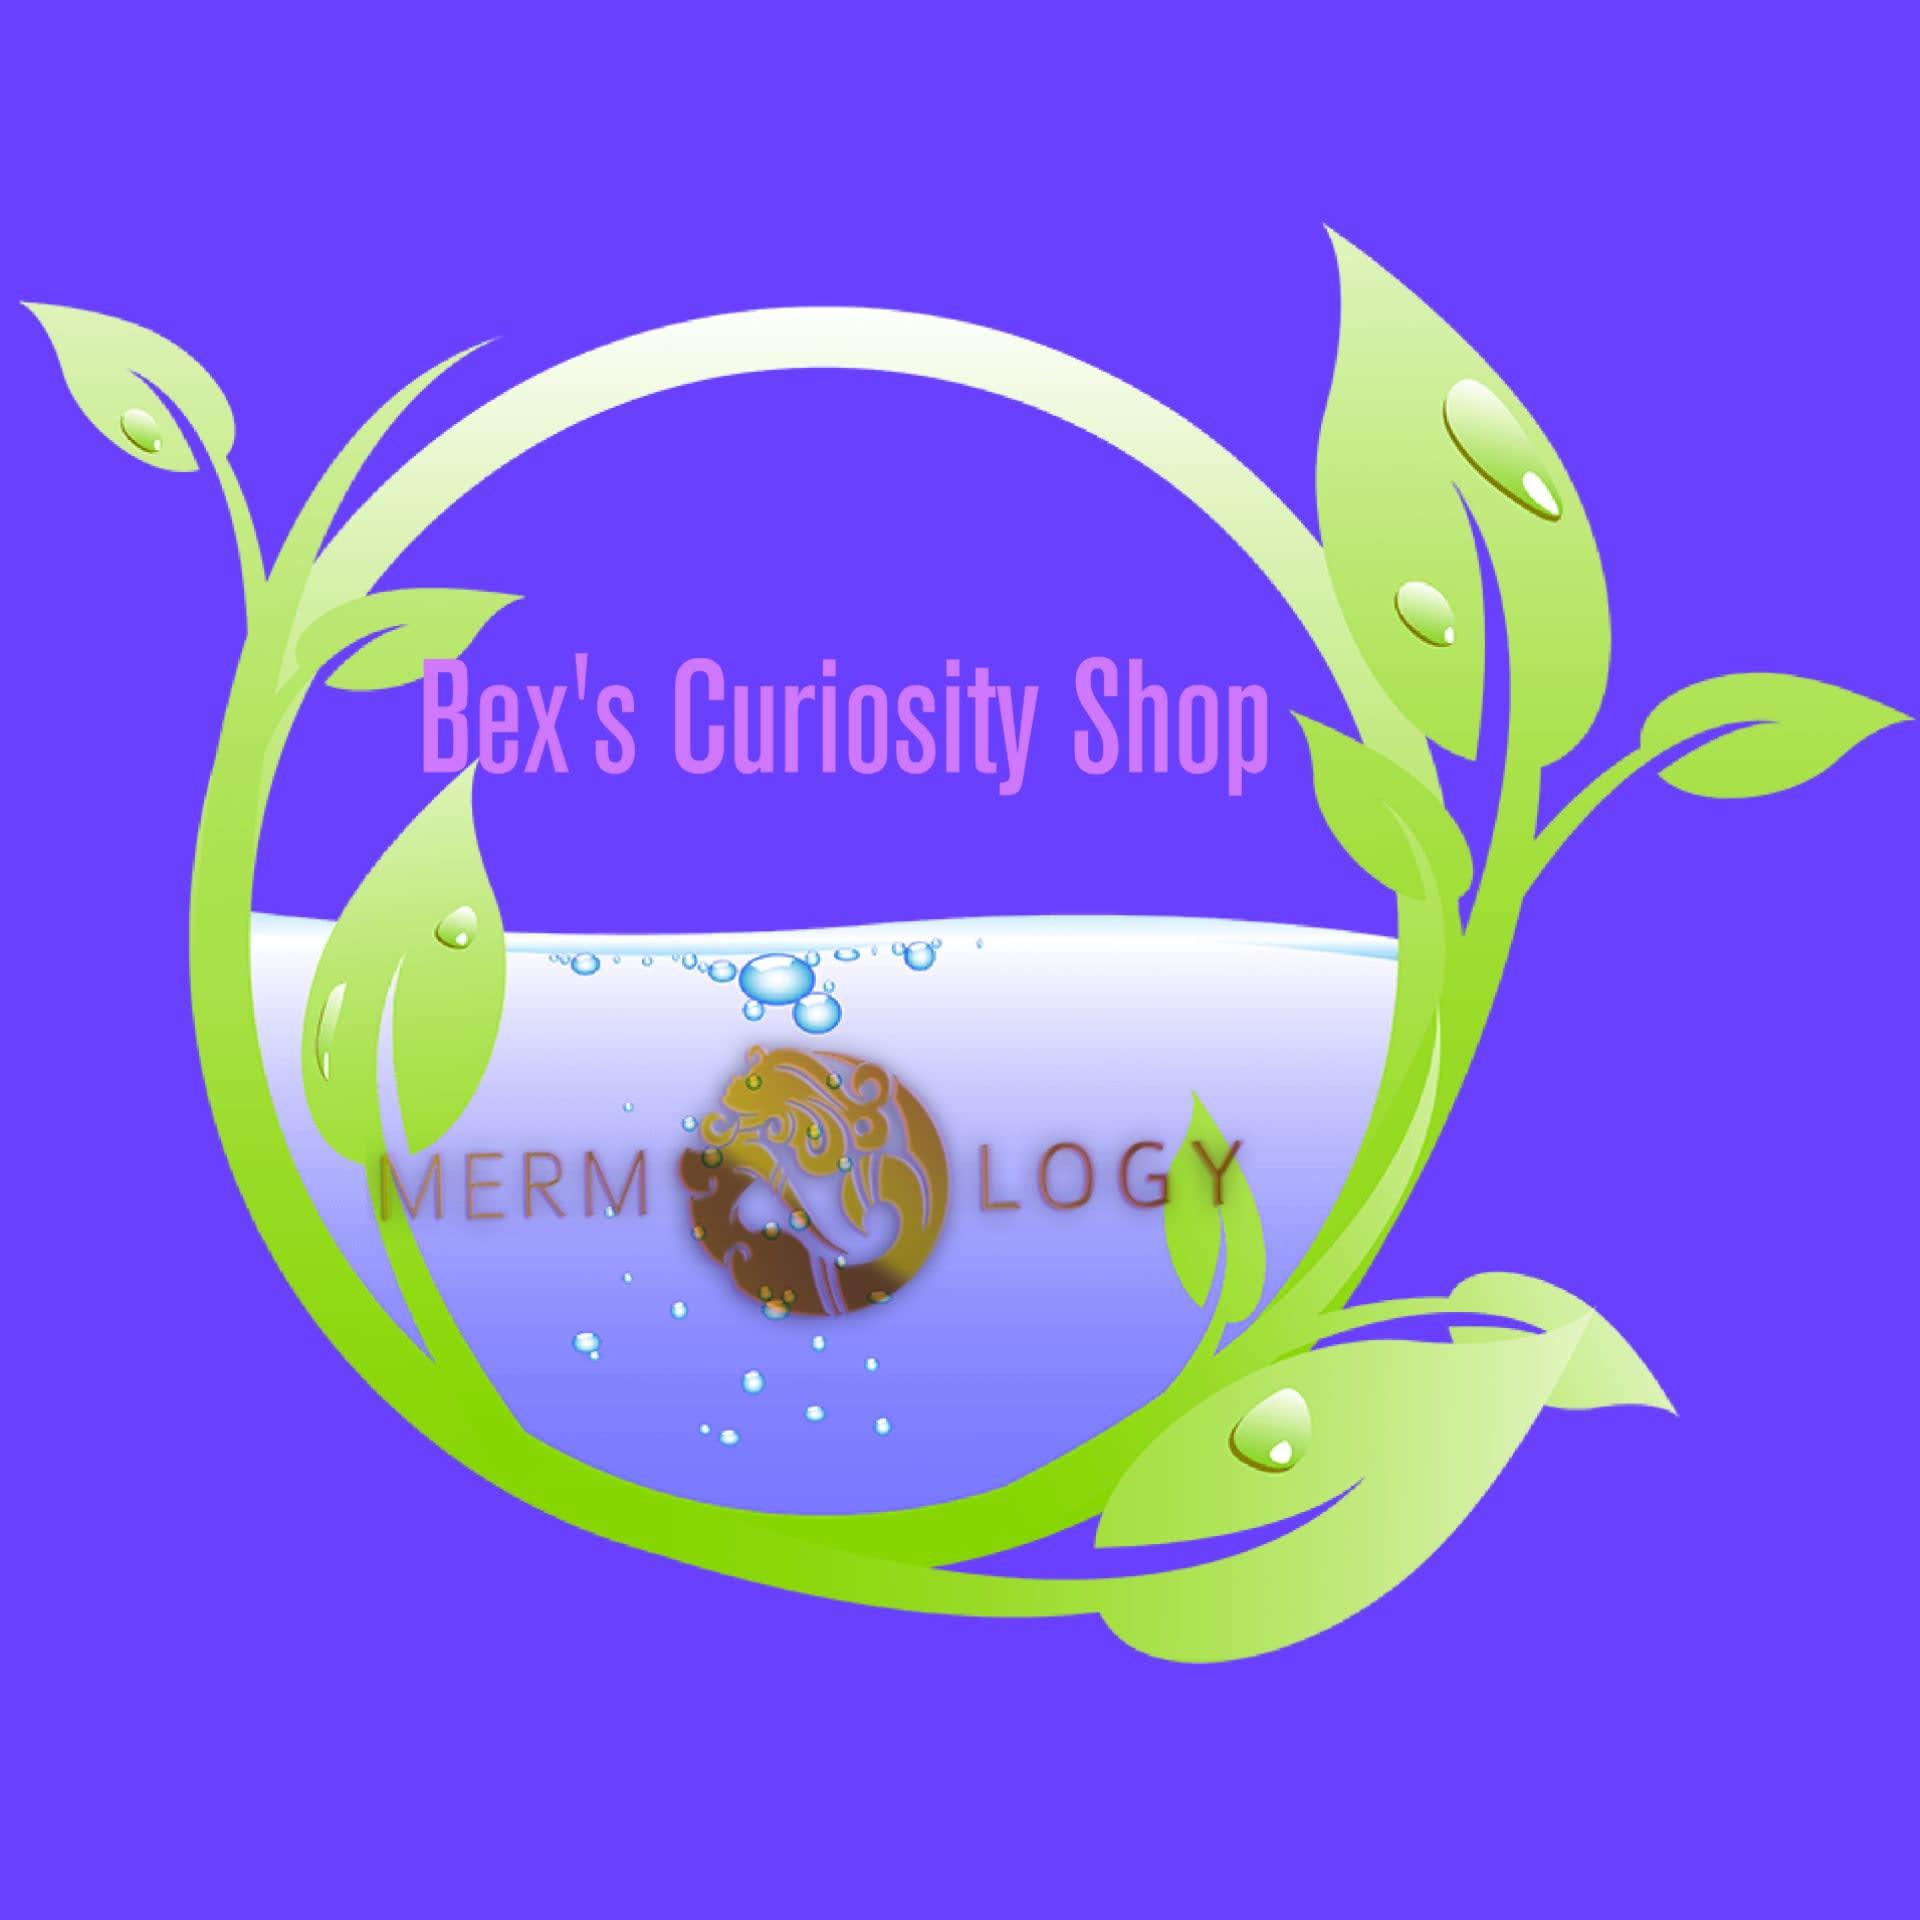 Bex'S Curiosity Shop